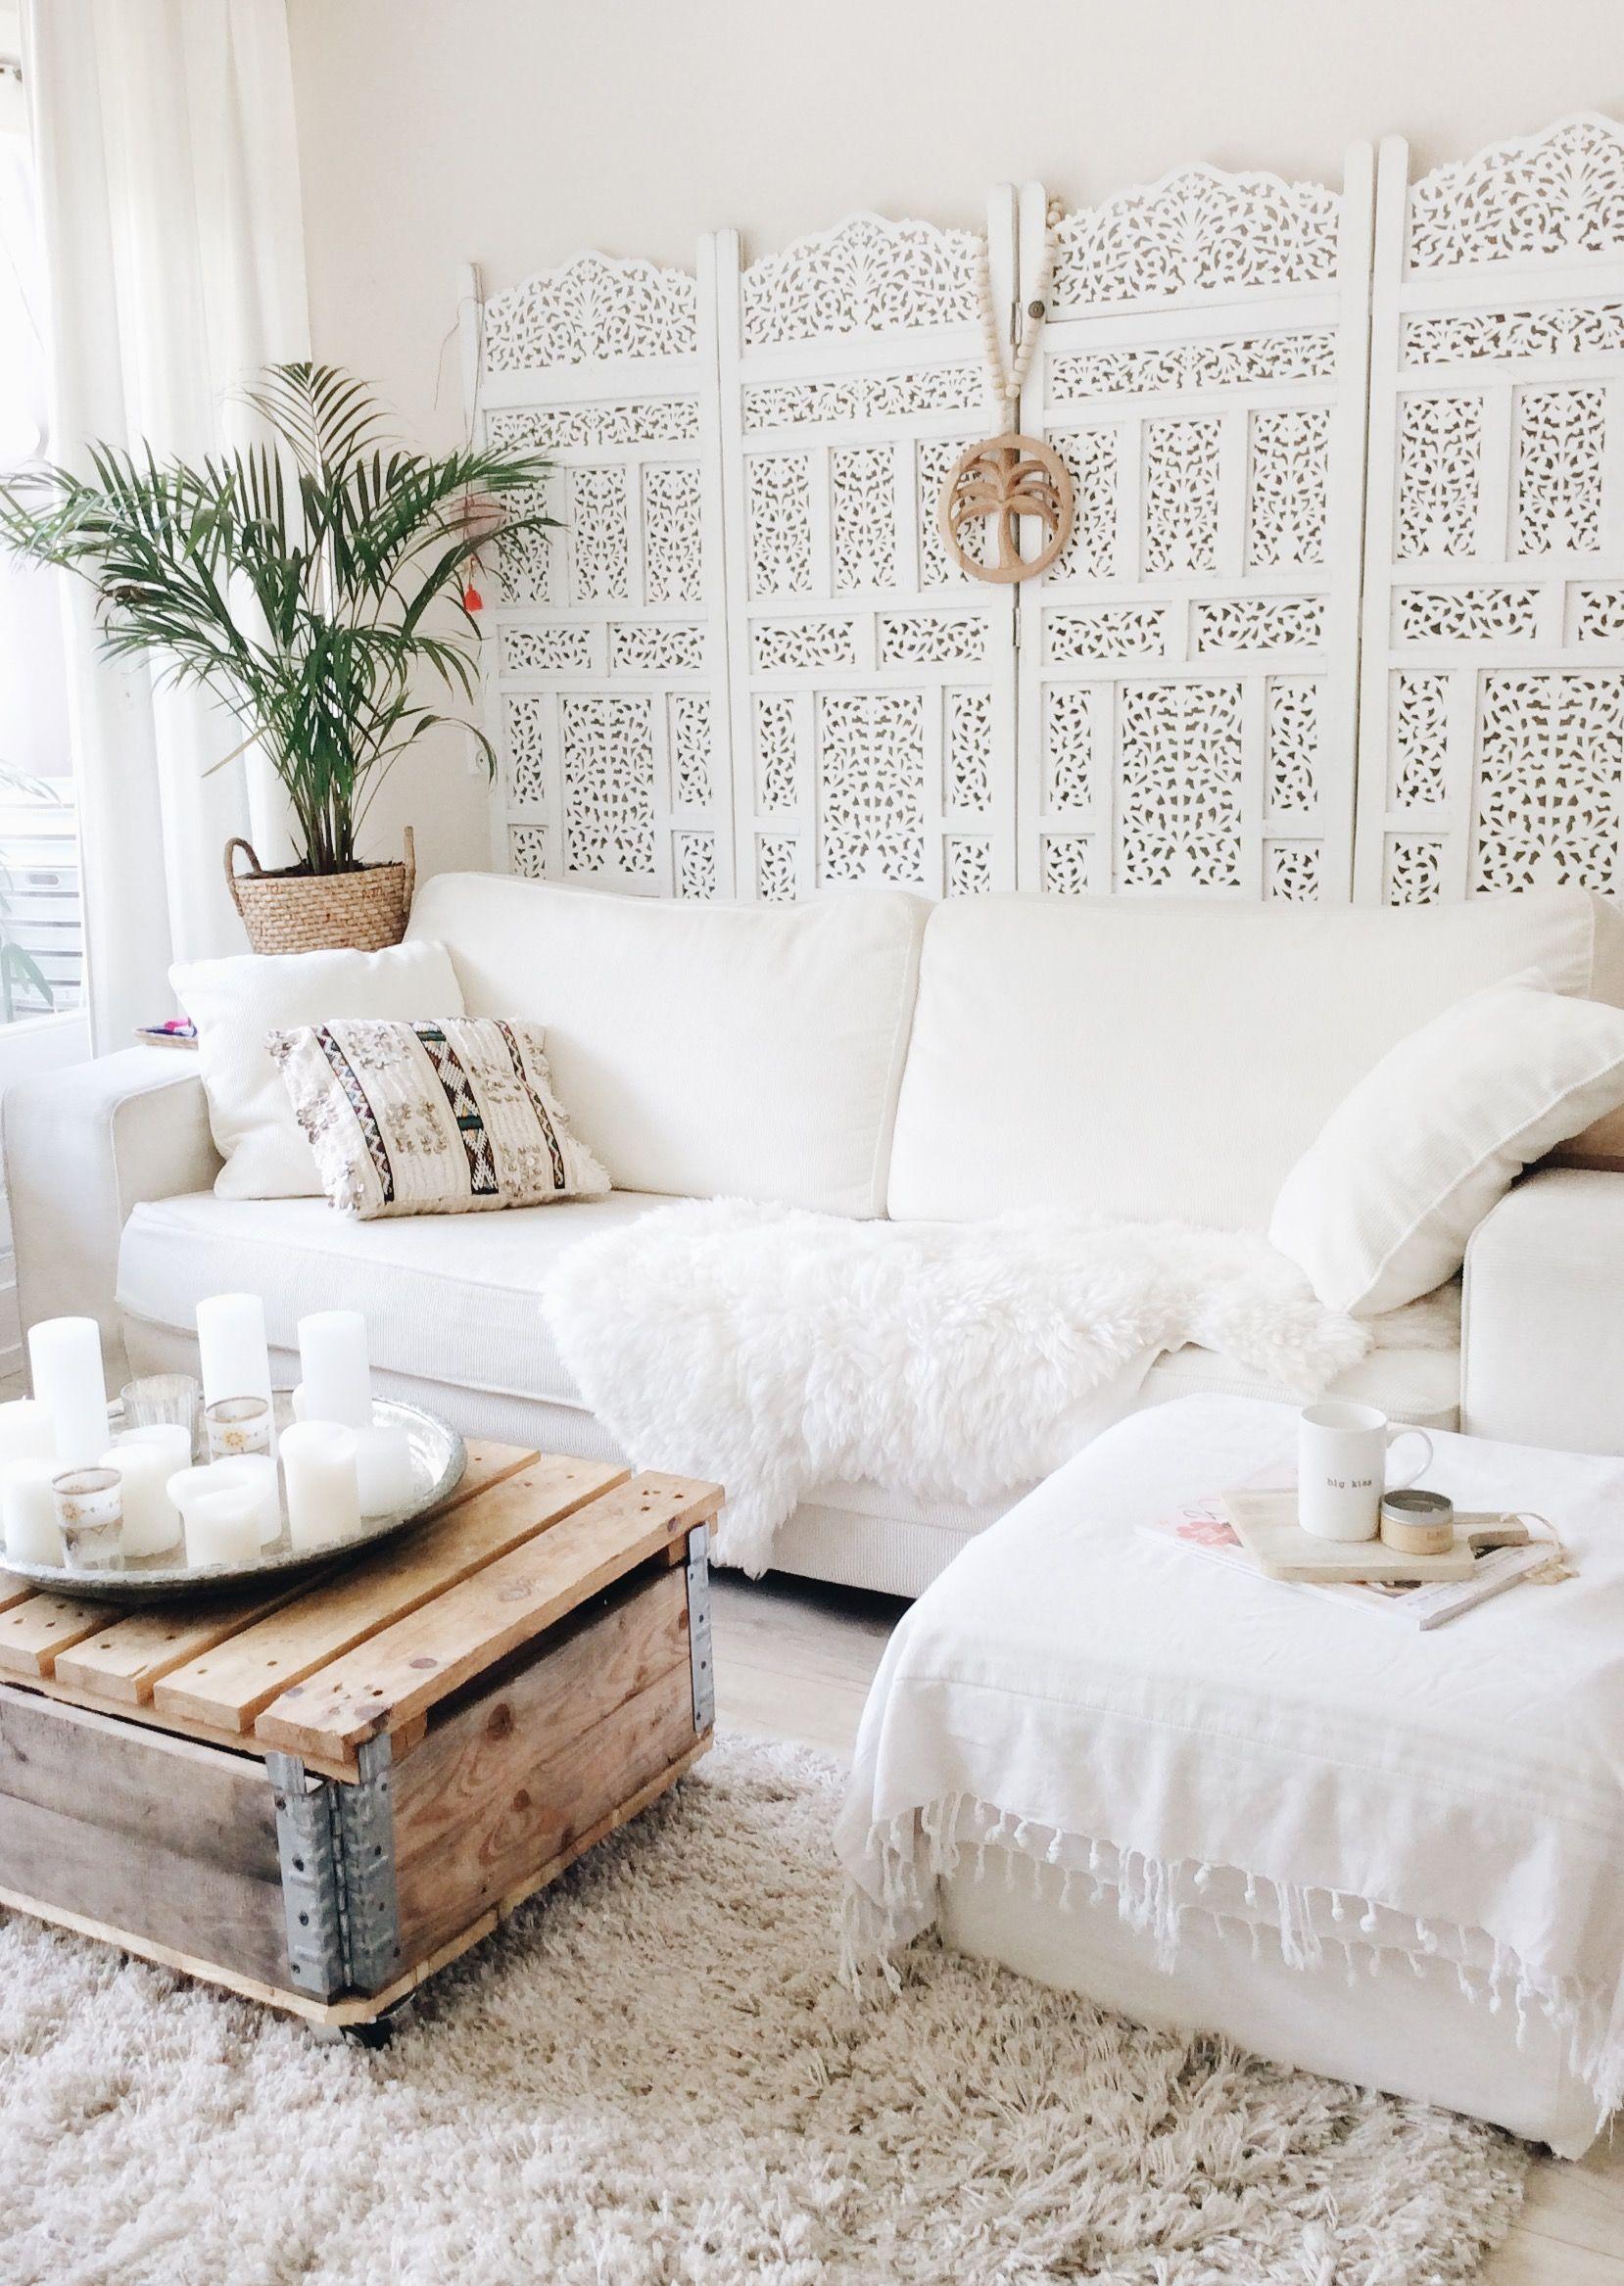 White bohemian interior @lovedbysheila on instagram   Interior ...